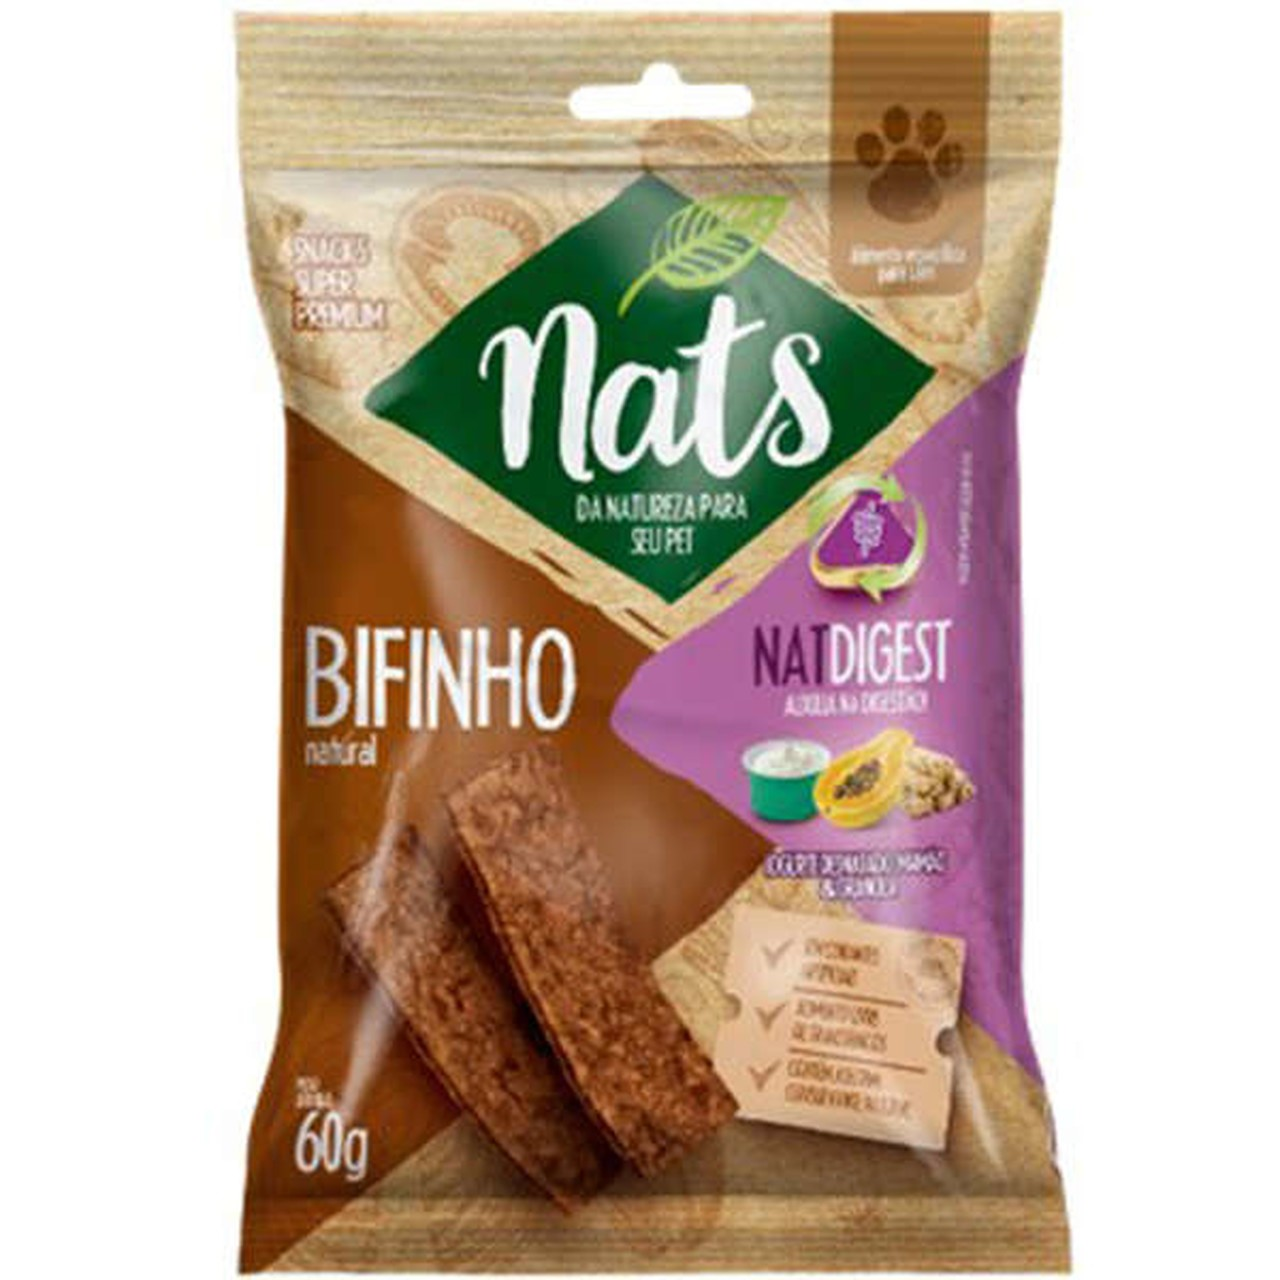 Bifinho Natural Nats NatDigest para Cães 60g